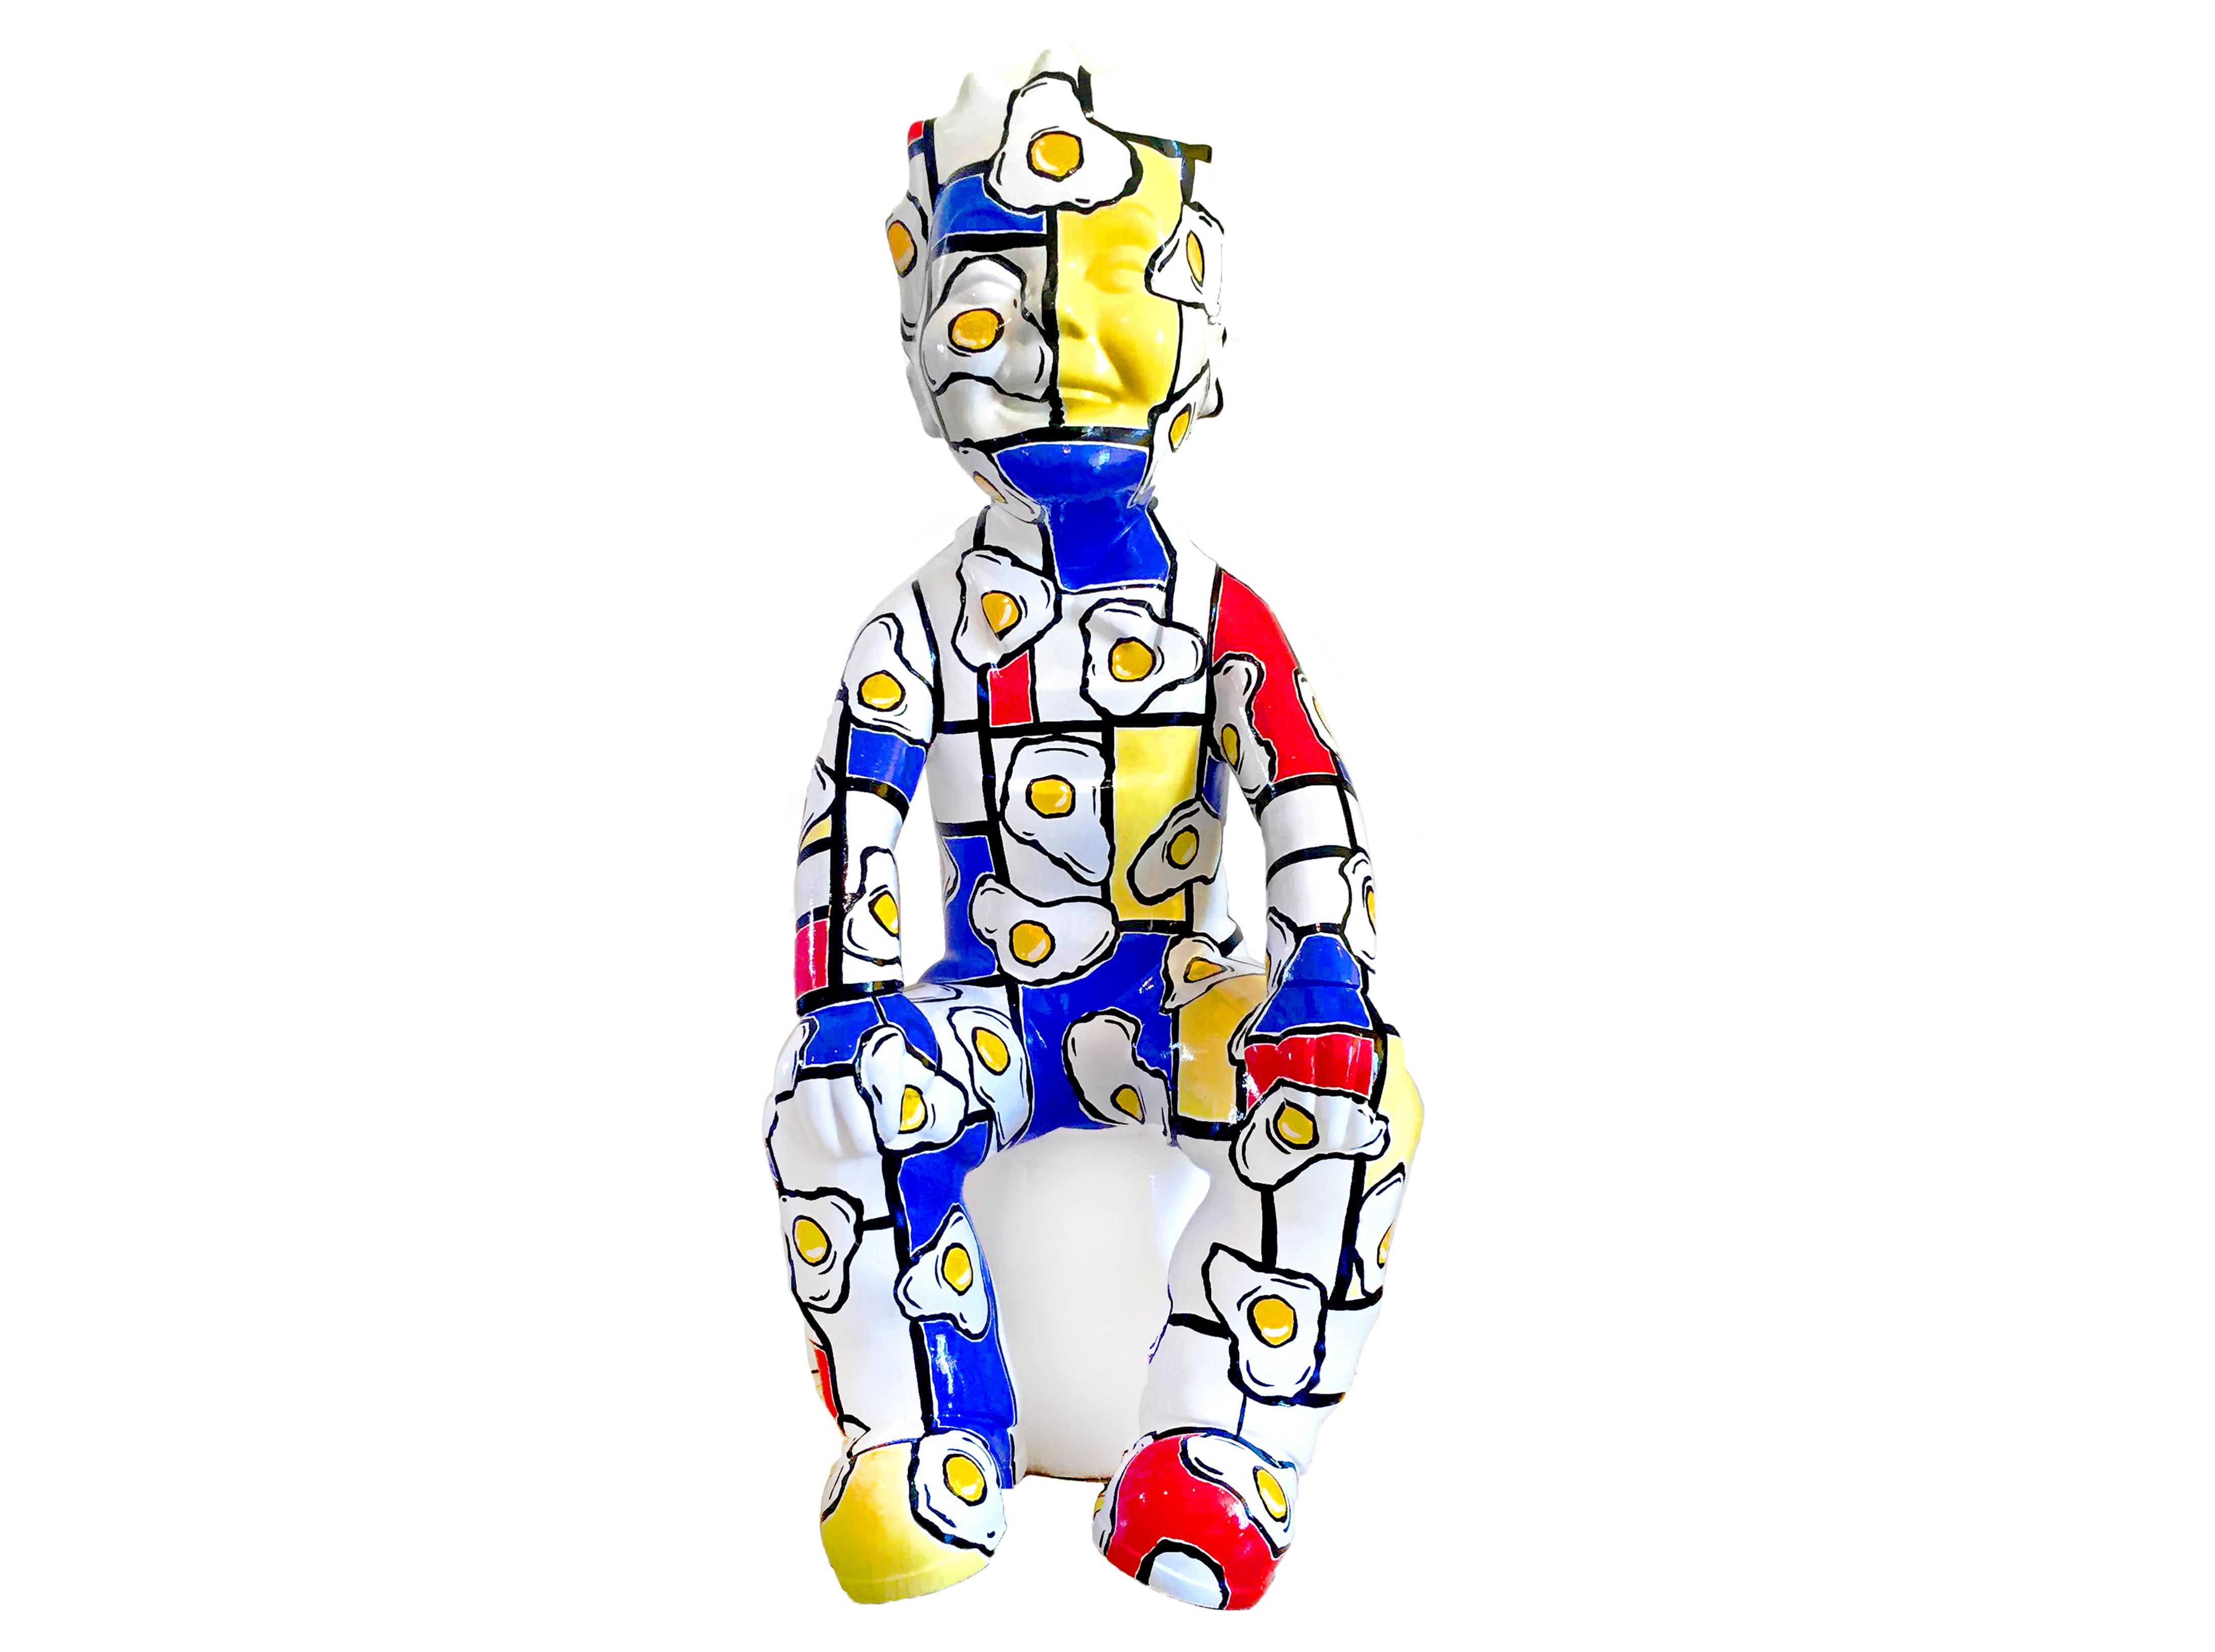 Mondrian Boy (2016)